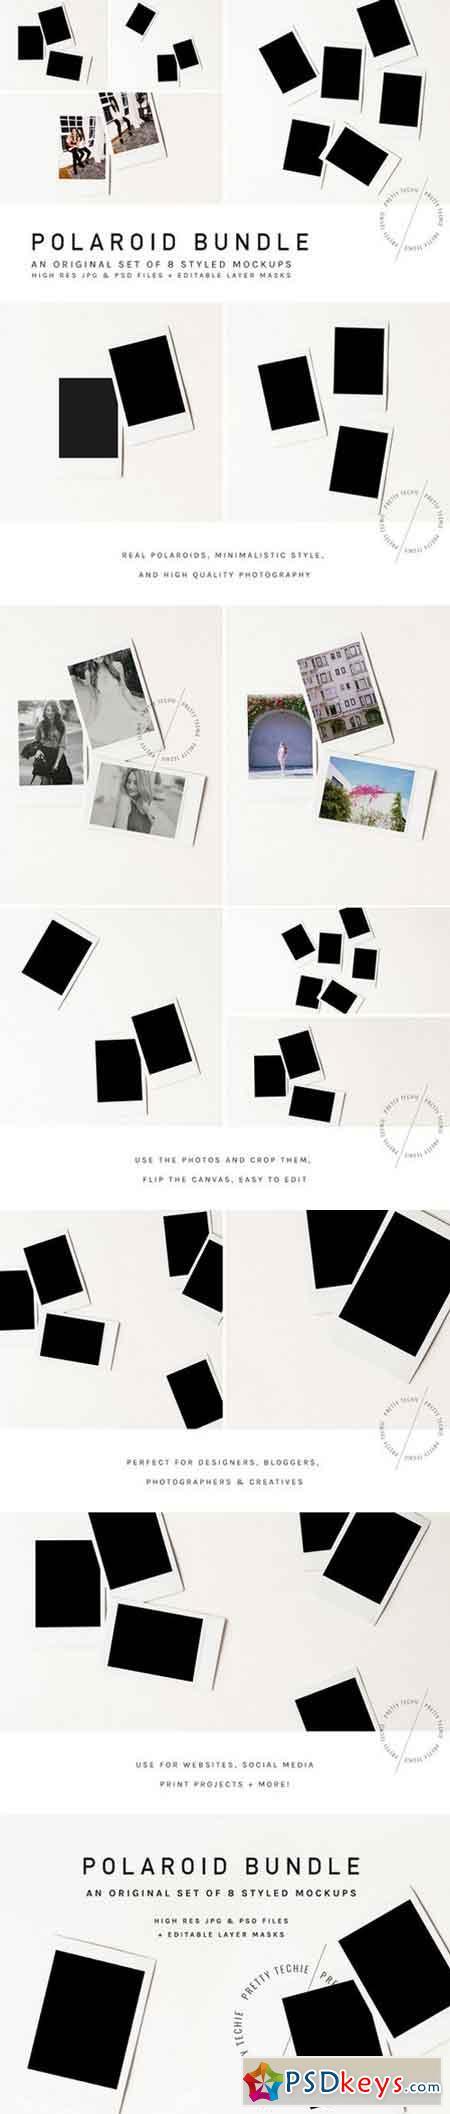 Polaroid Mockup Bundle 791168